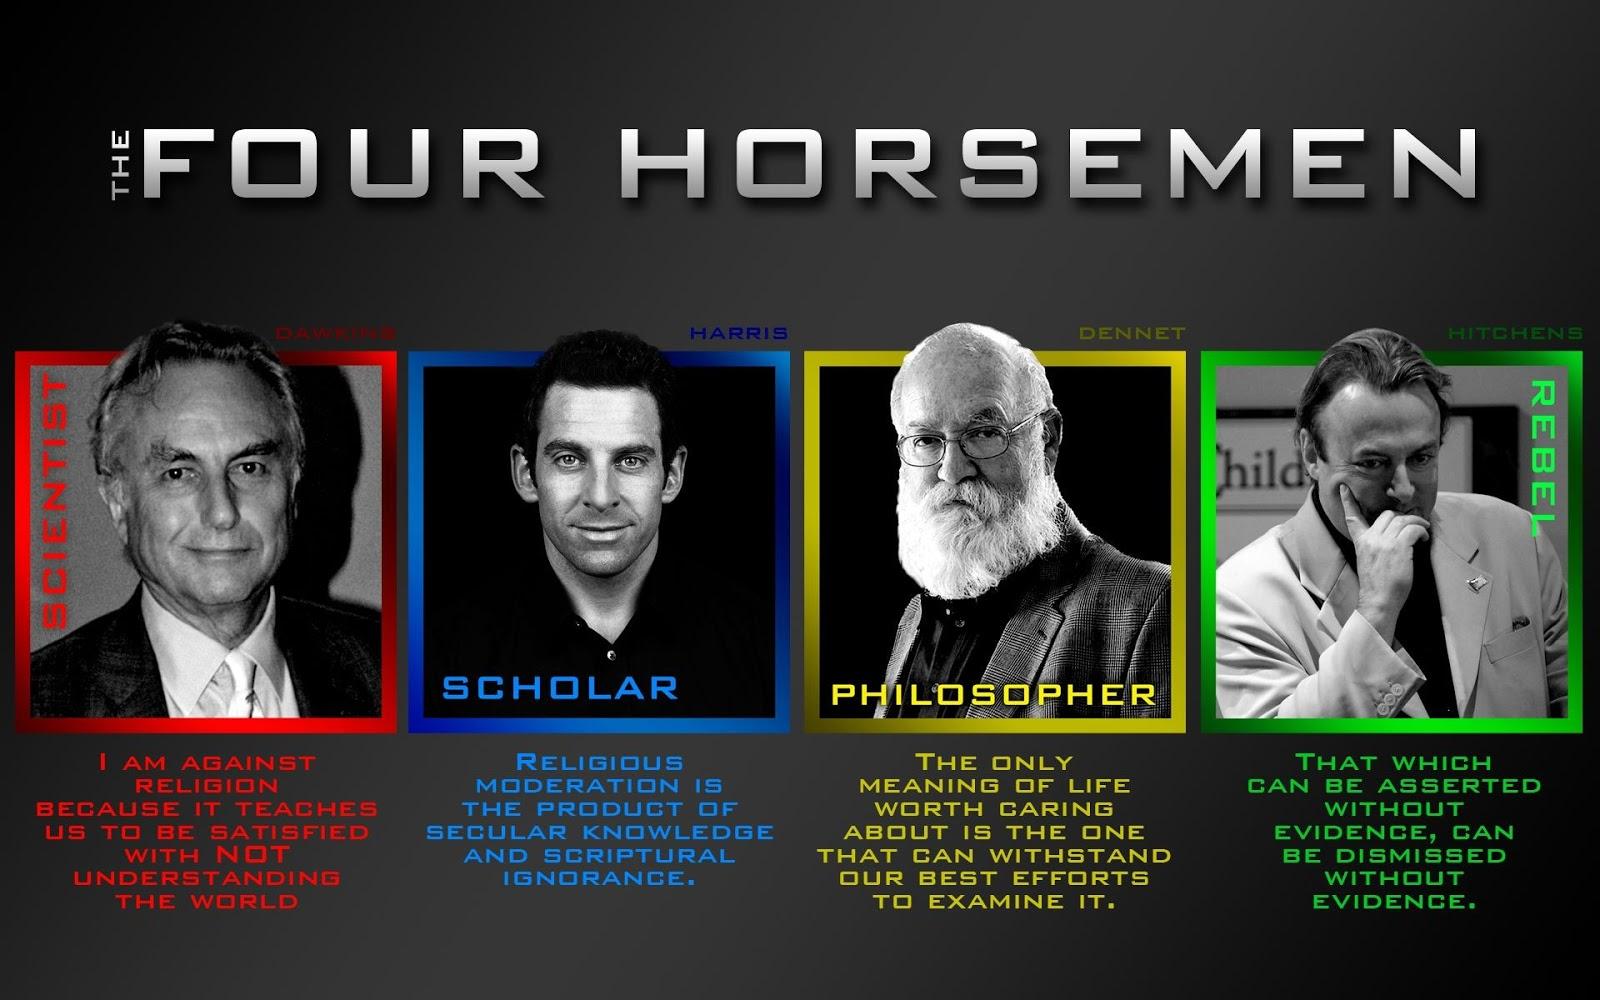 Neoatheism